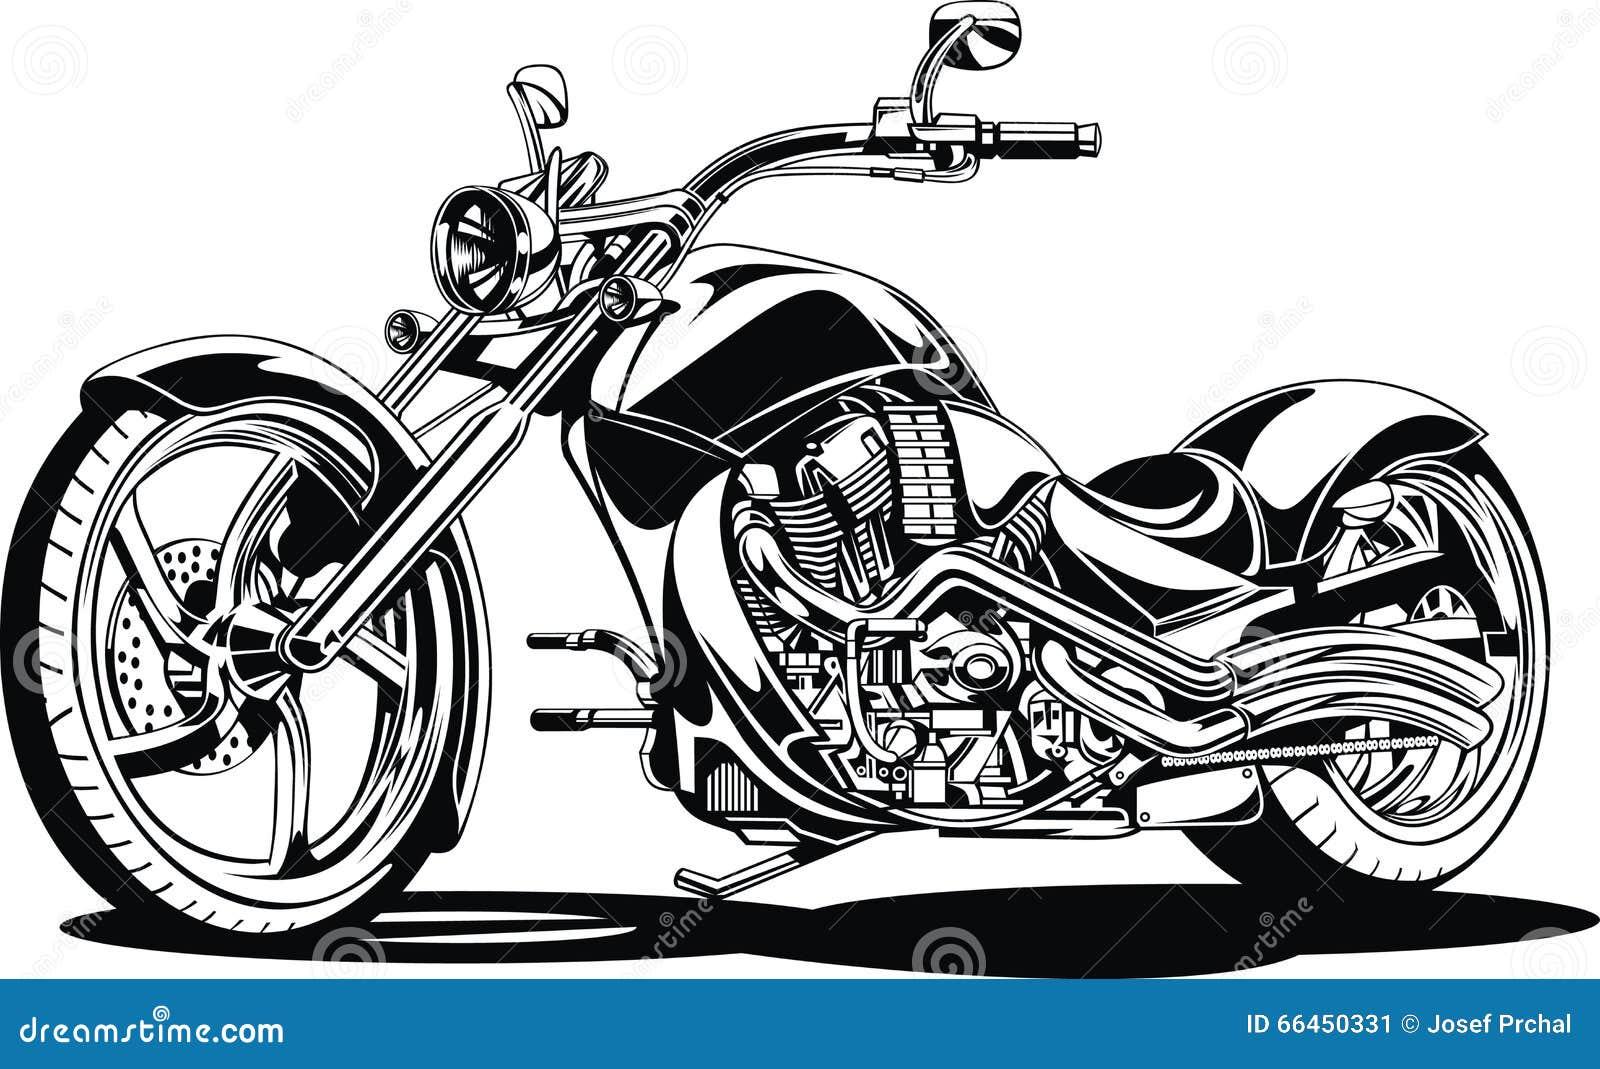 716786 Motorcycle Art 1965 Panhead besides Clipart 245143 further Stock De Ilustraci C3 B3n Mi Dise C3 B1o Blanco Y Negro De La Moto Image66450331 likewise 141585843147 likewise Moto. on black harley davidson